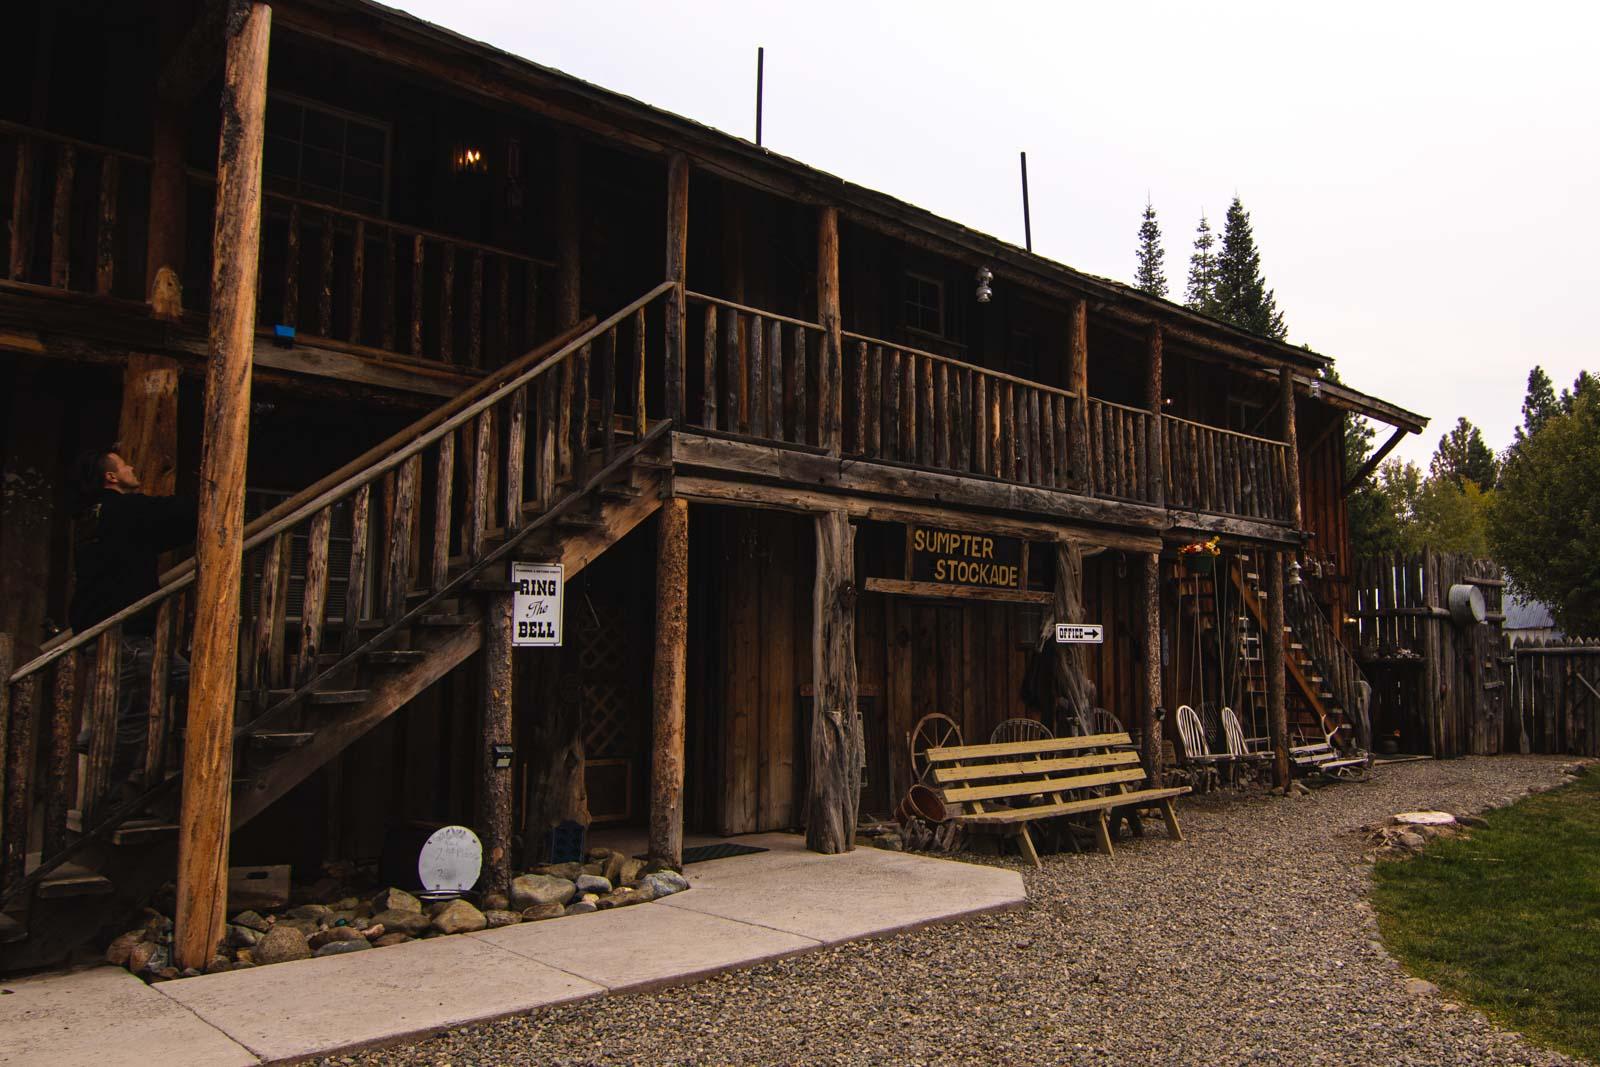 adventure_motorcycle_tour_sumpter_stockade_motel